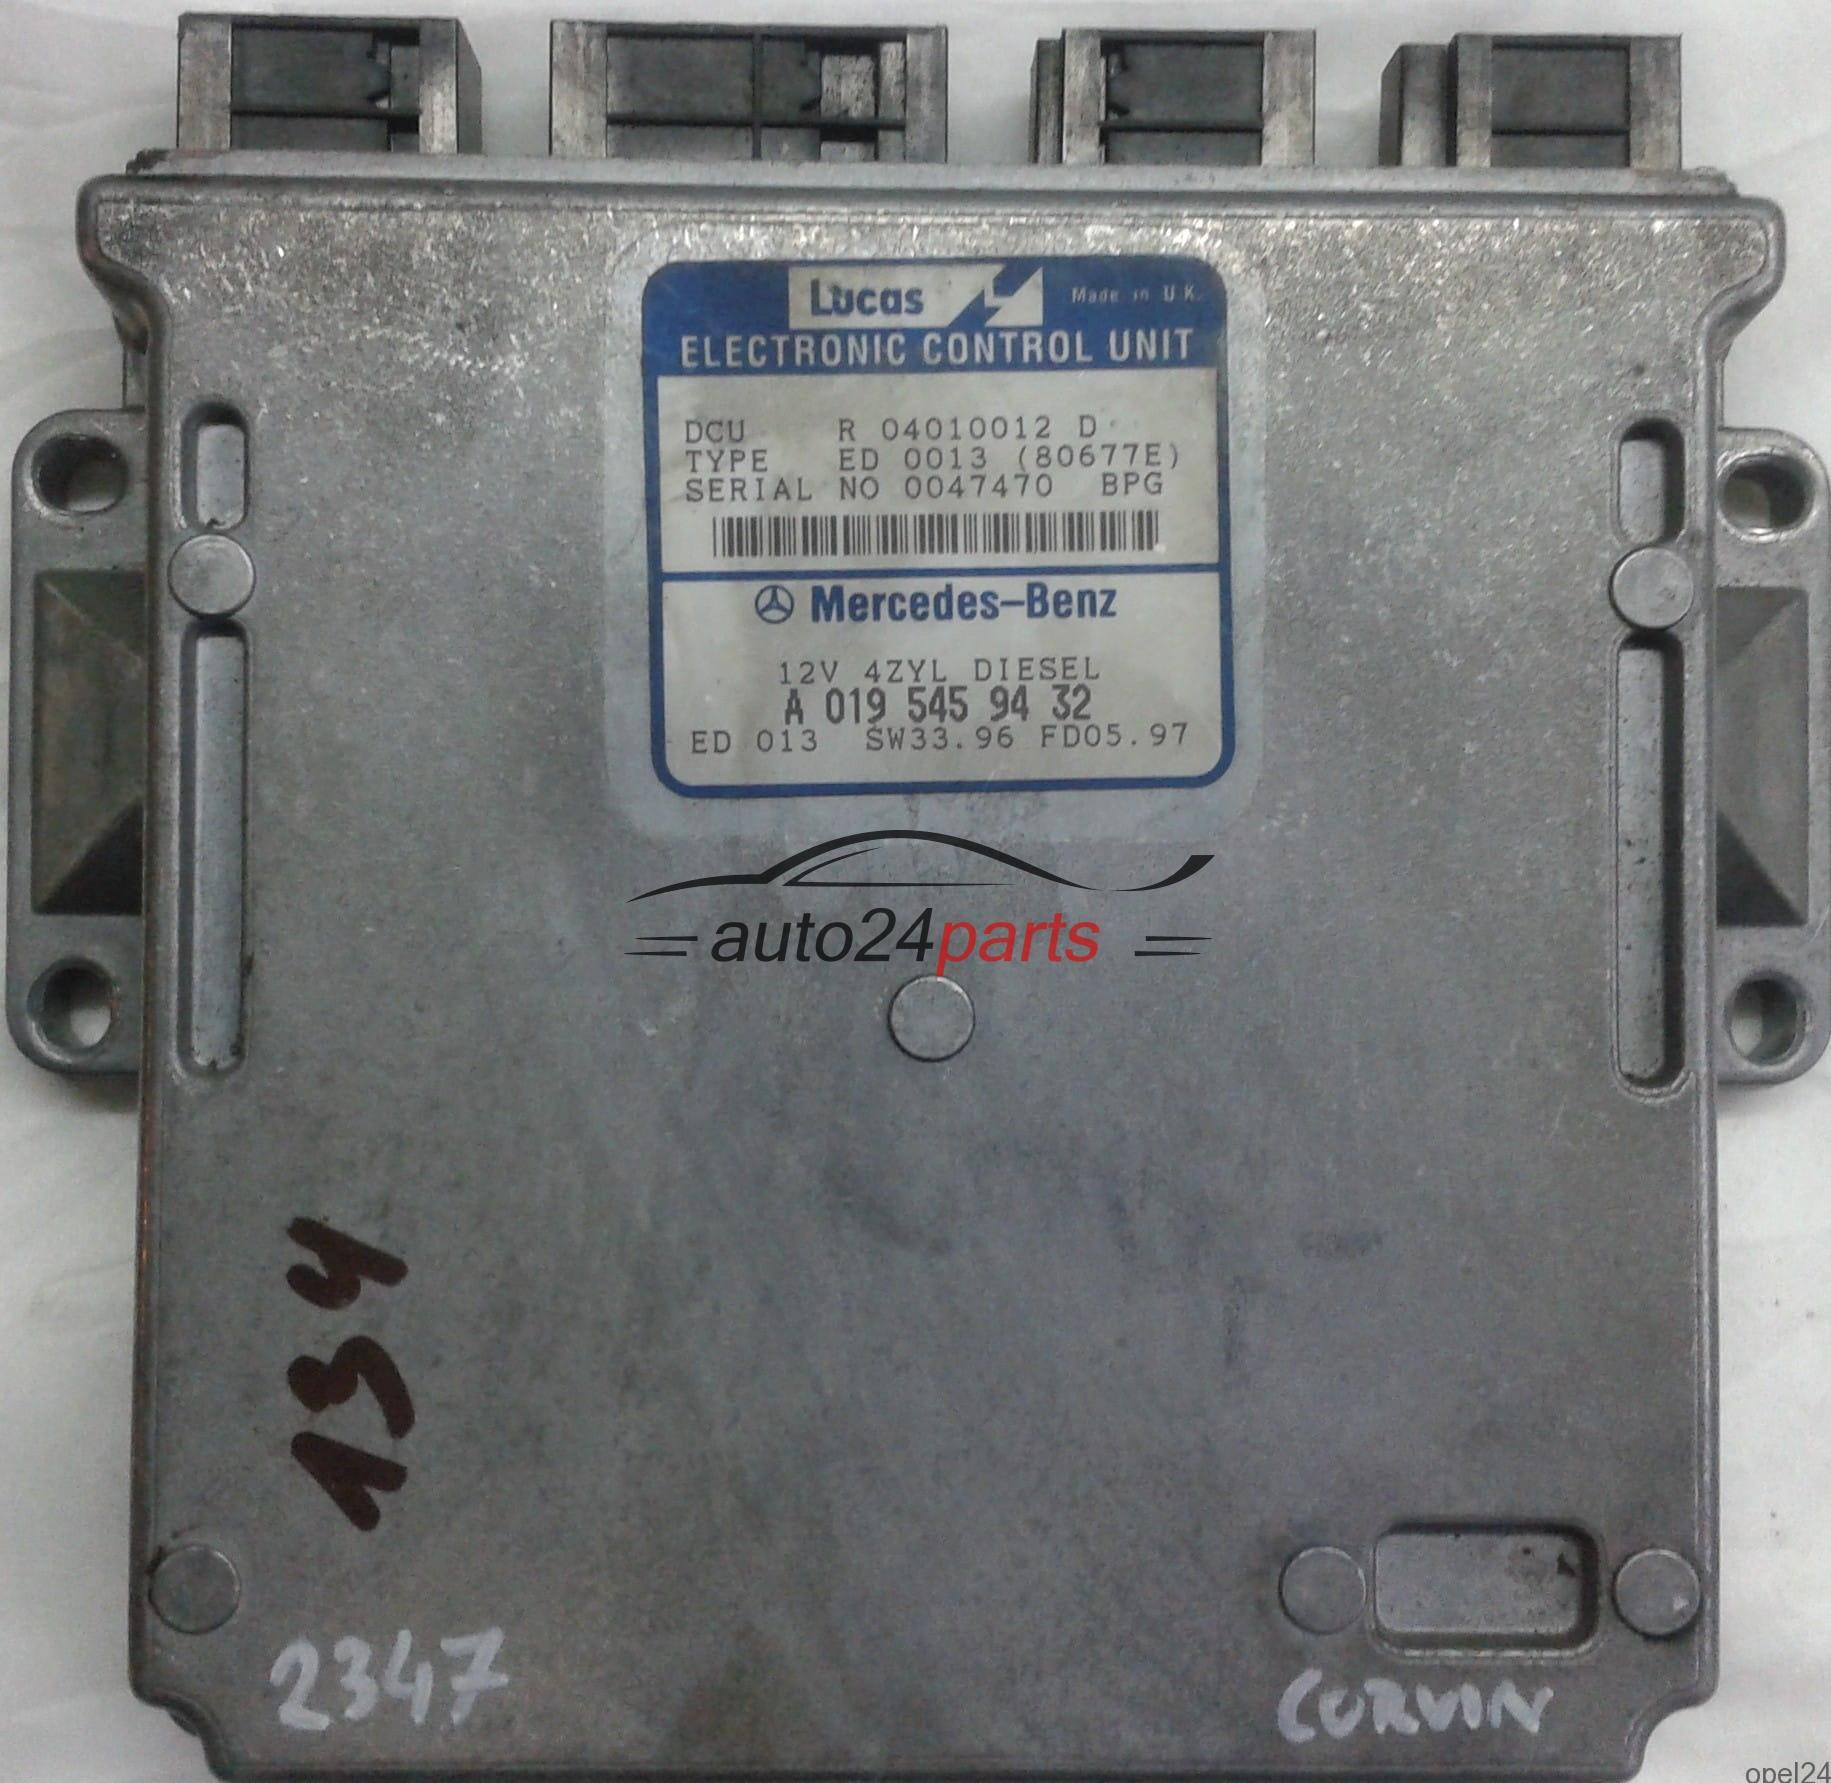 ECU ENGINE CONTROLLER MERCEDES W202 C-KLASS C220 W210 E-KLASS E220  A0195459432, A 019 545 94 32, 0195459432, R 04010012 D R04010012D, ED 0013  (80677E)